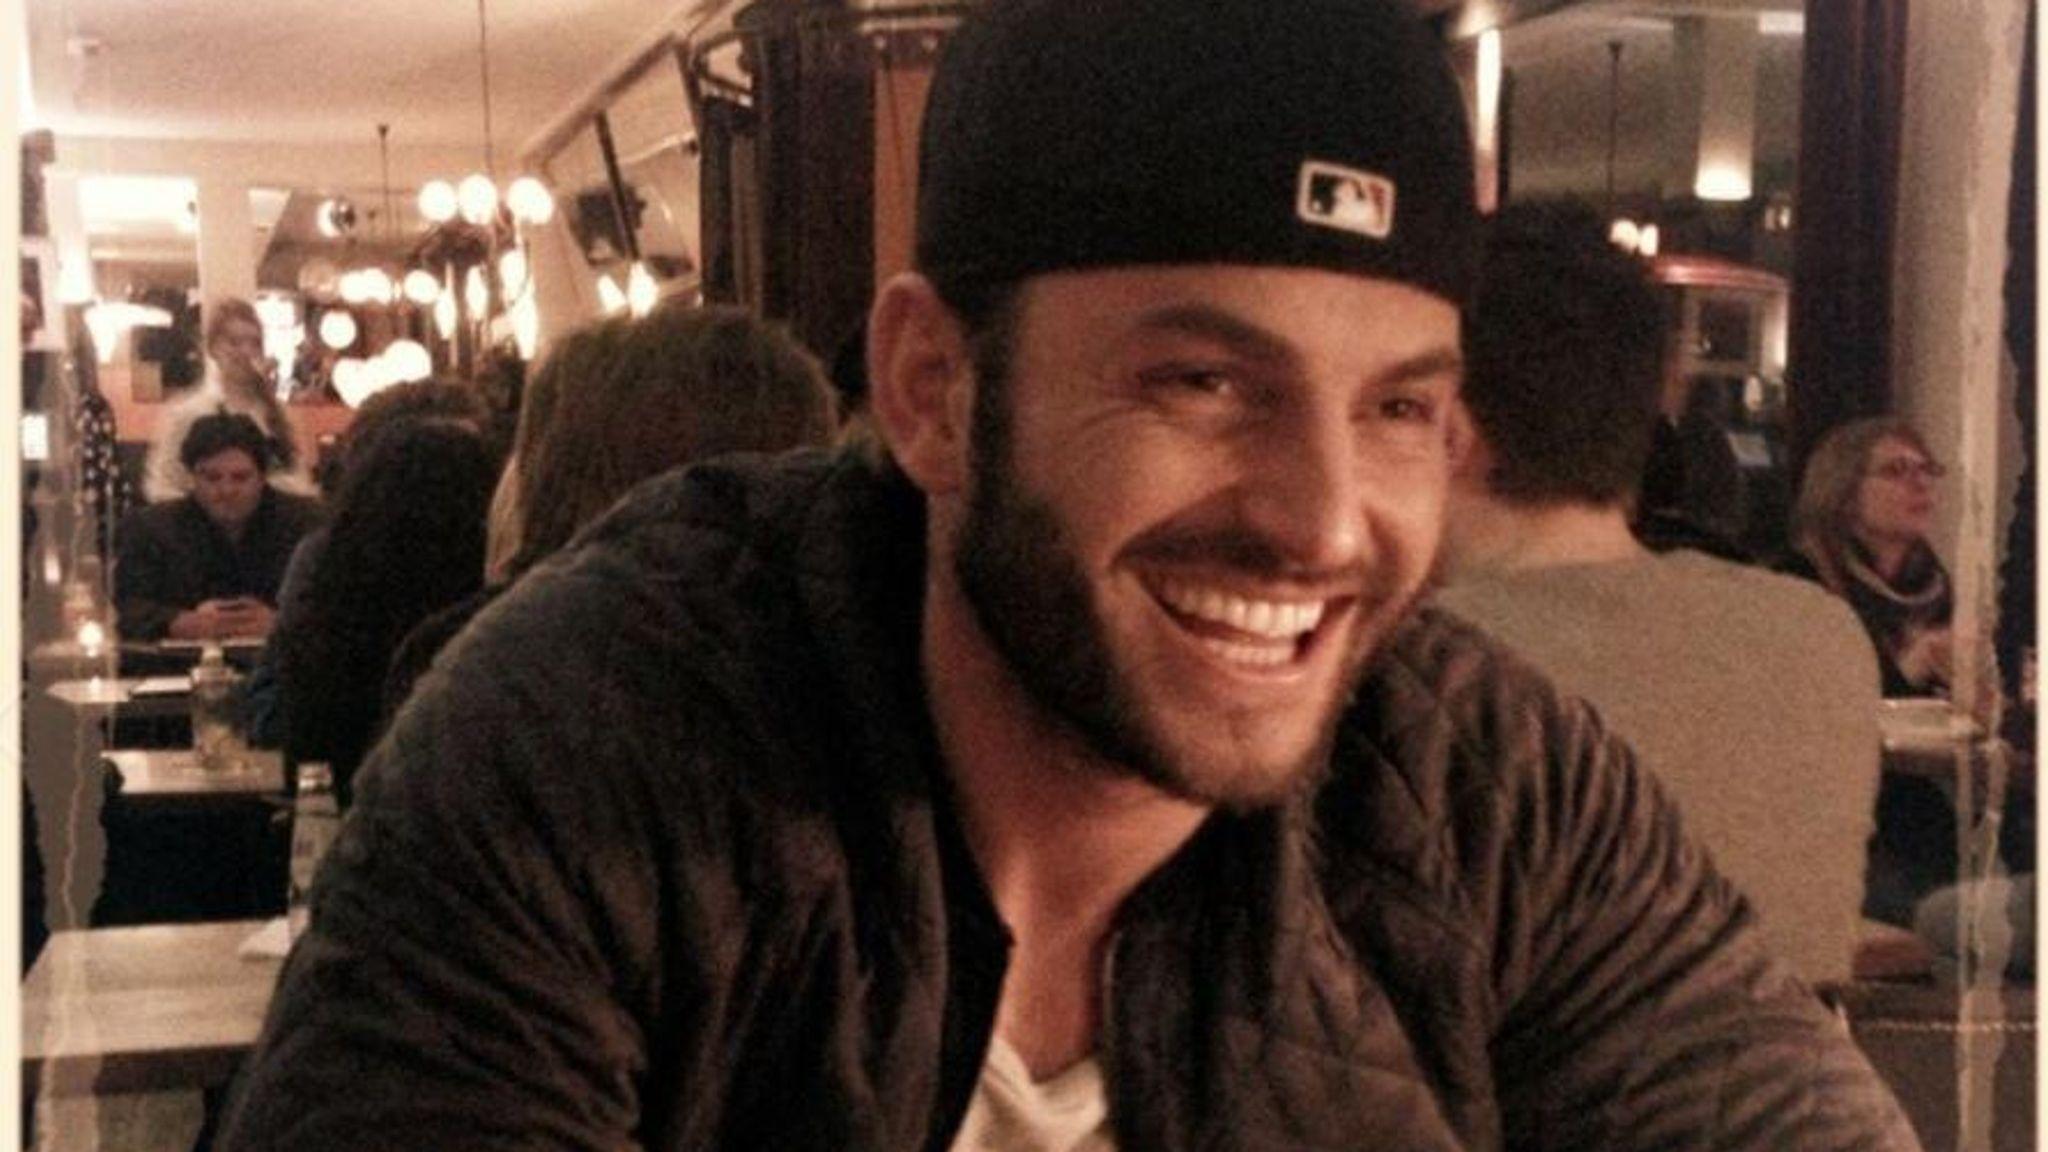 Flamur Beqiri murder: Man arrested in Denmark over shooting of suspected London gangster